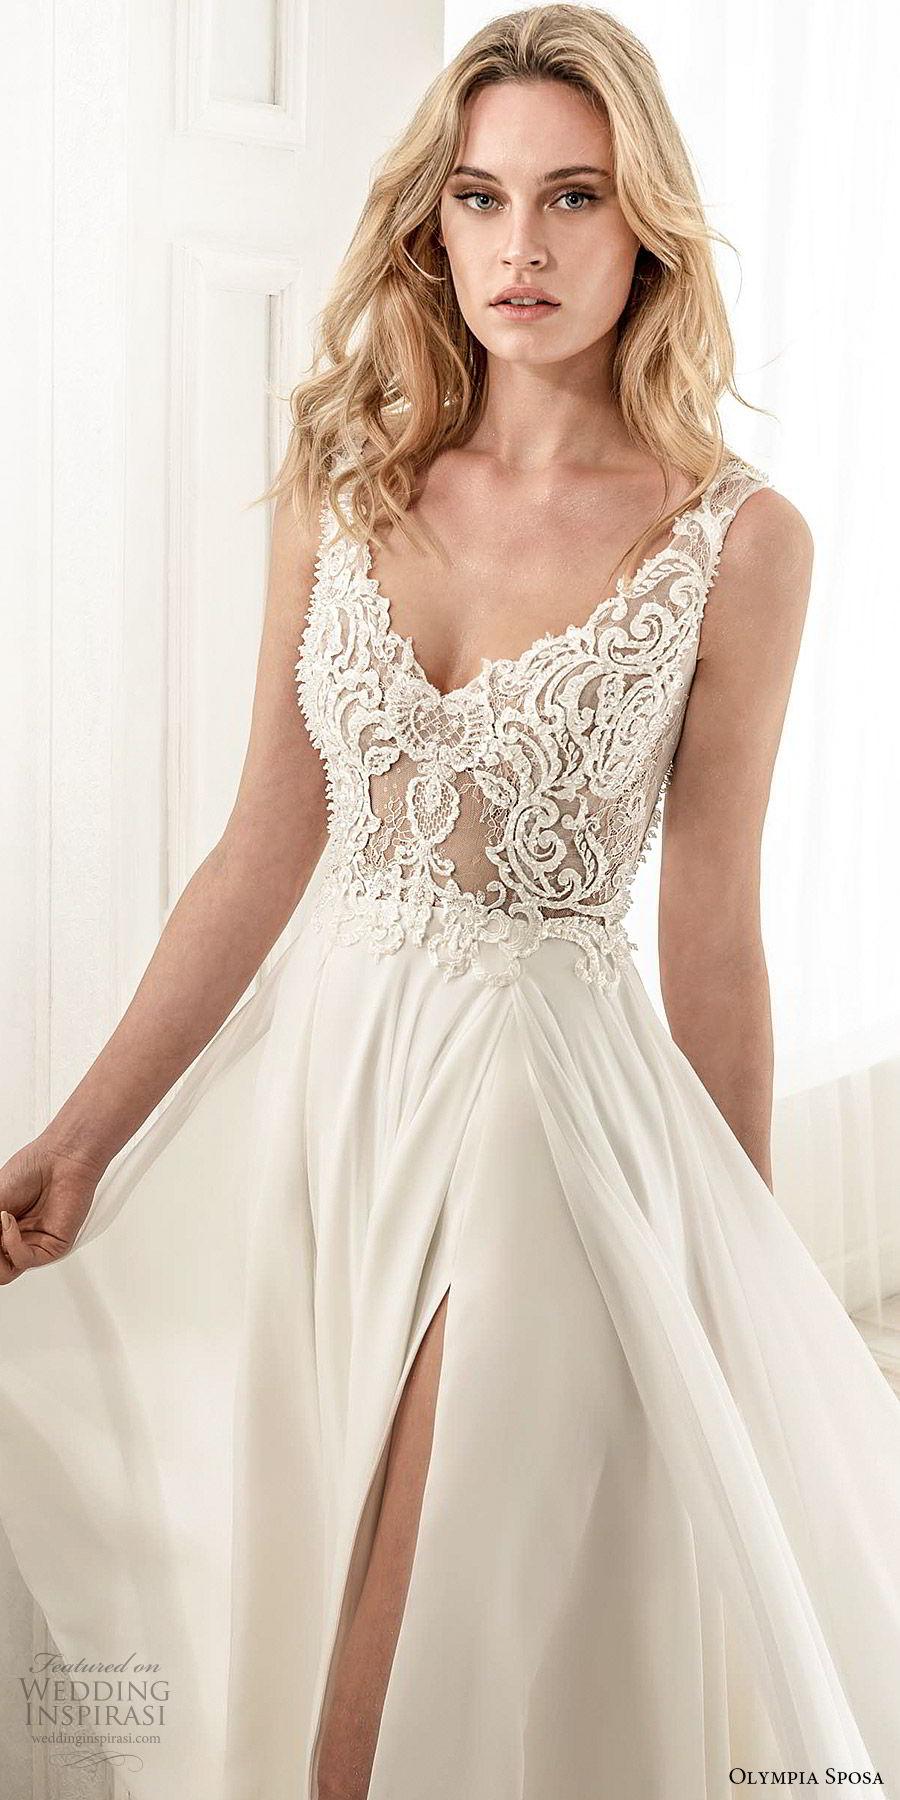 olympia sposa 2020 bridal sleeveless thick straps v neckline sheer embellished lace bodice a line ball gown wedding dress (13) slit elegant sexy modern mv